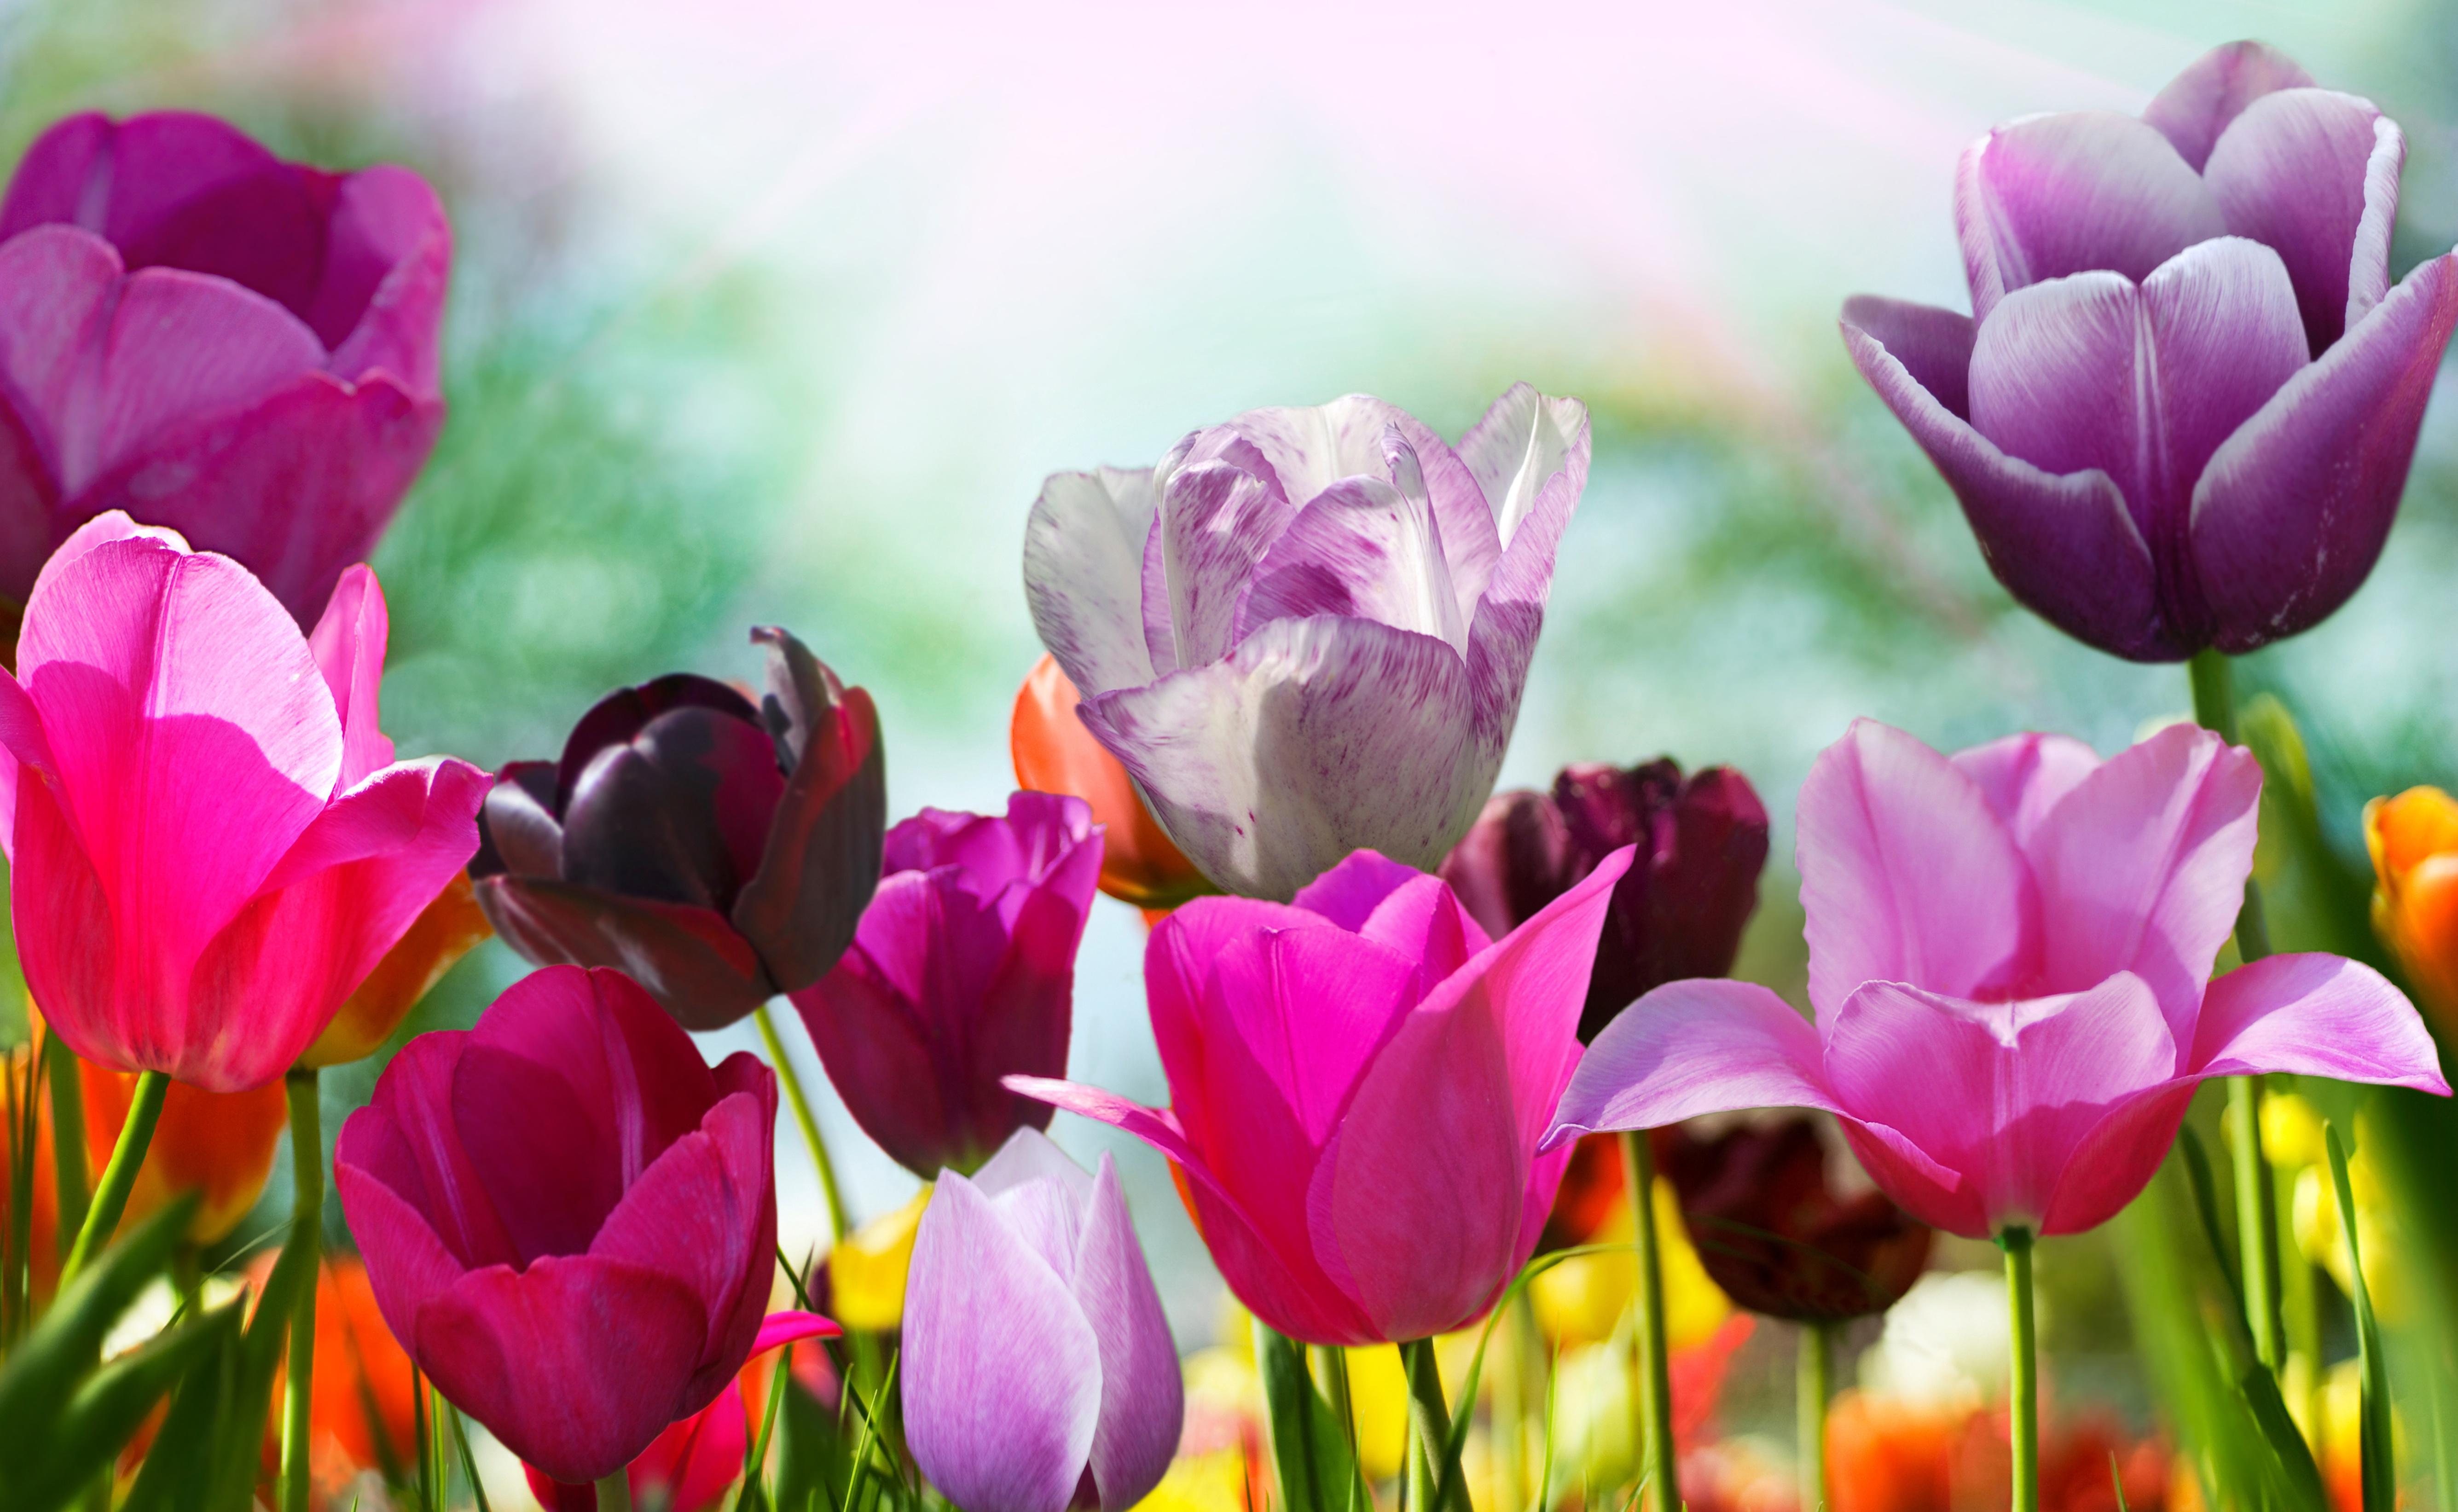 тюльпаны краски загрузить